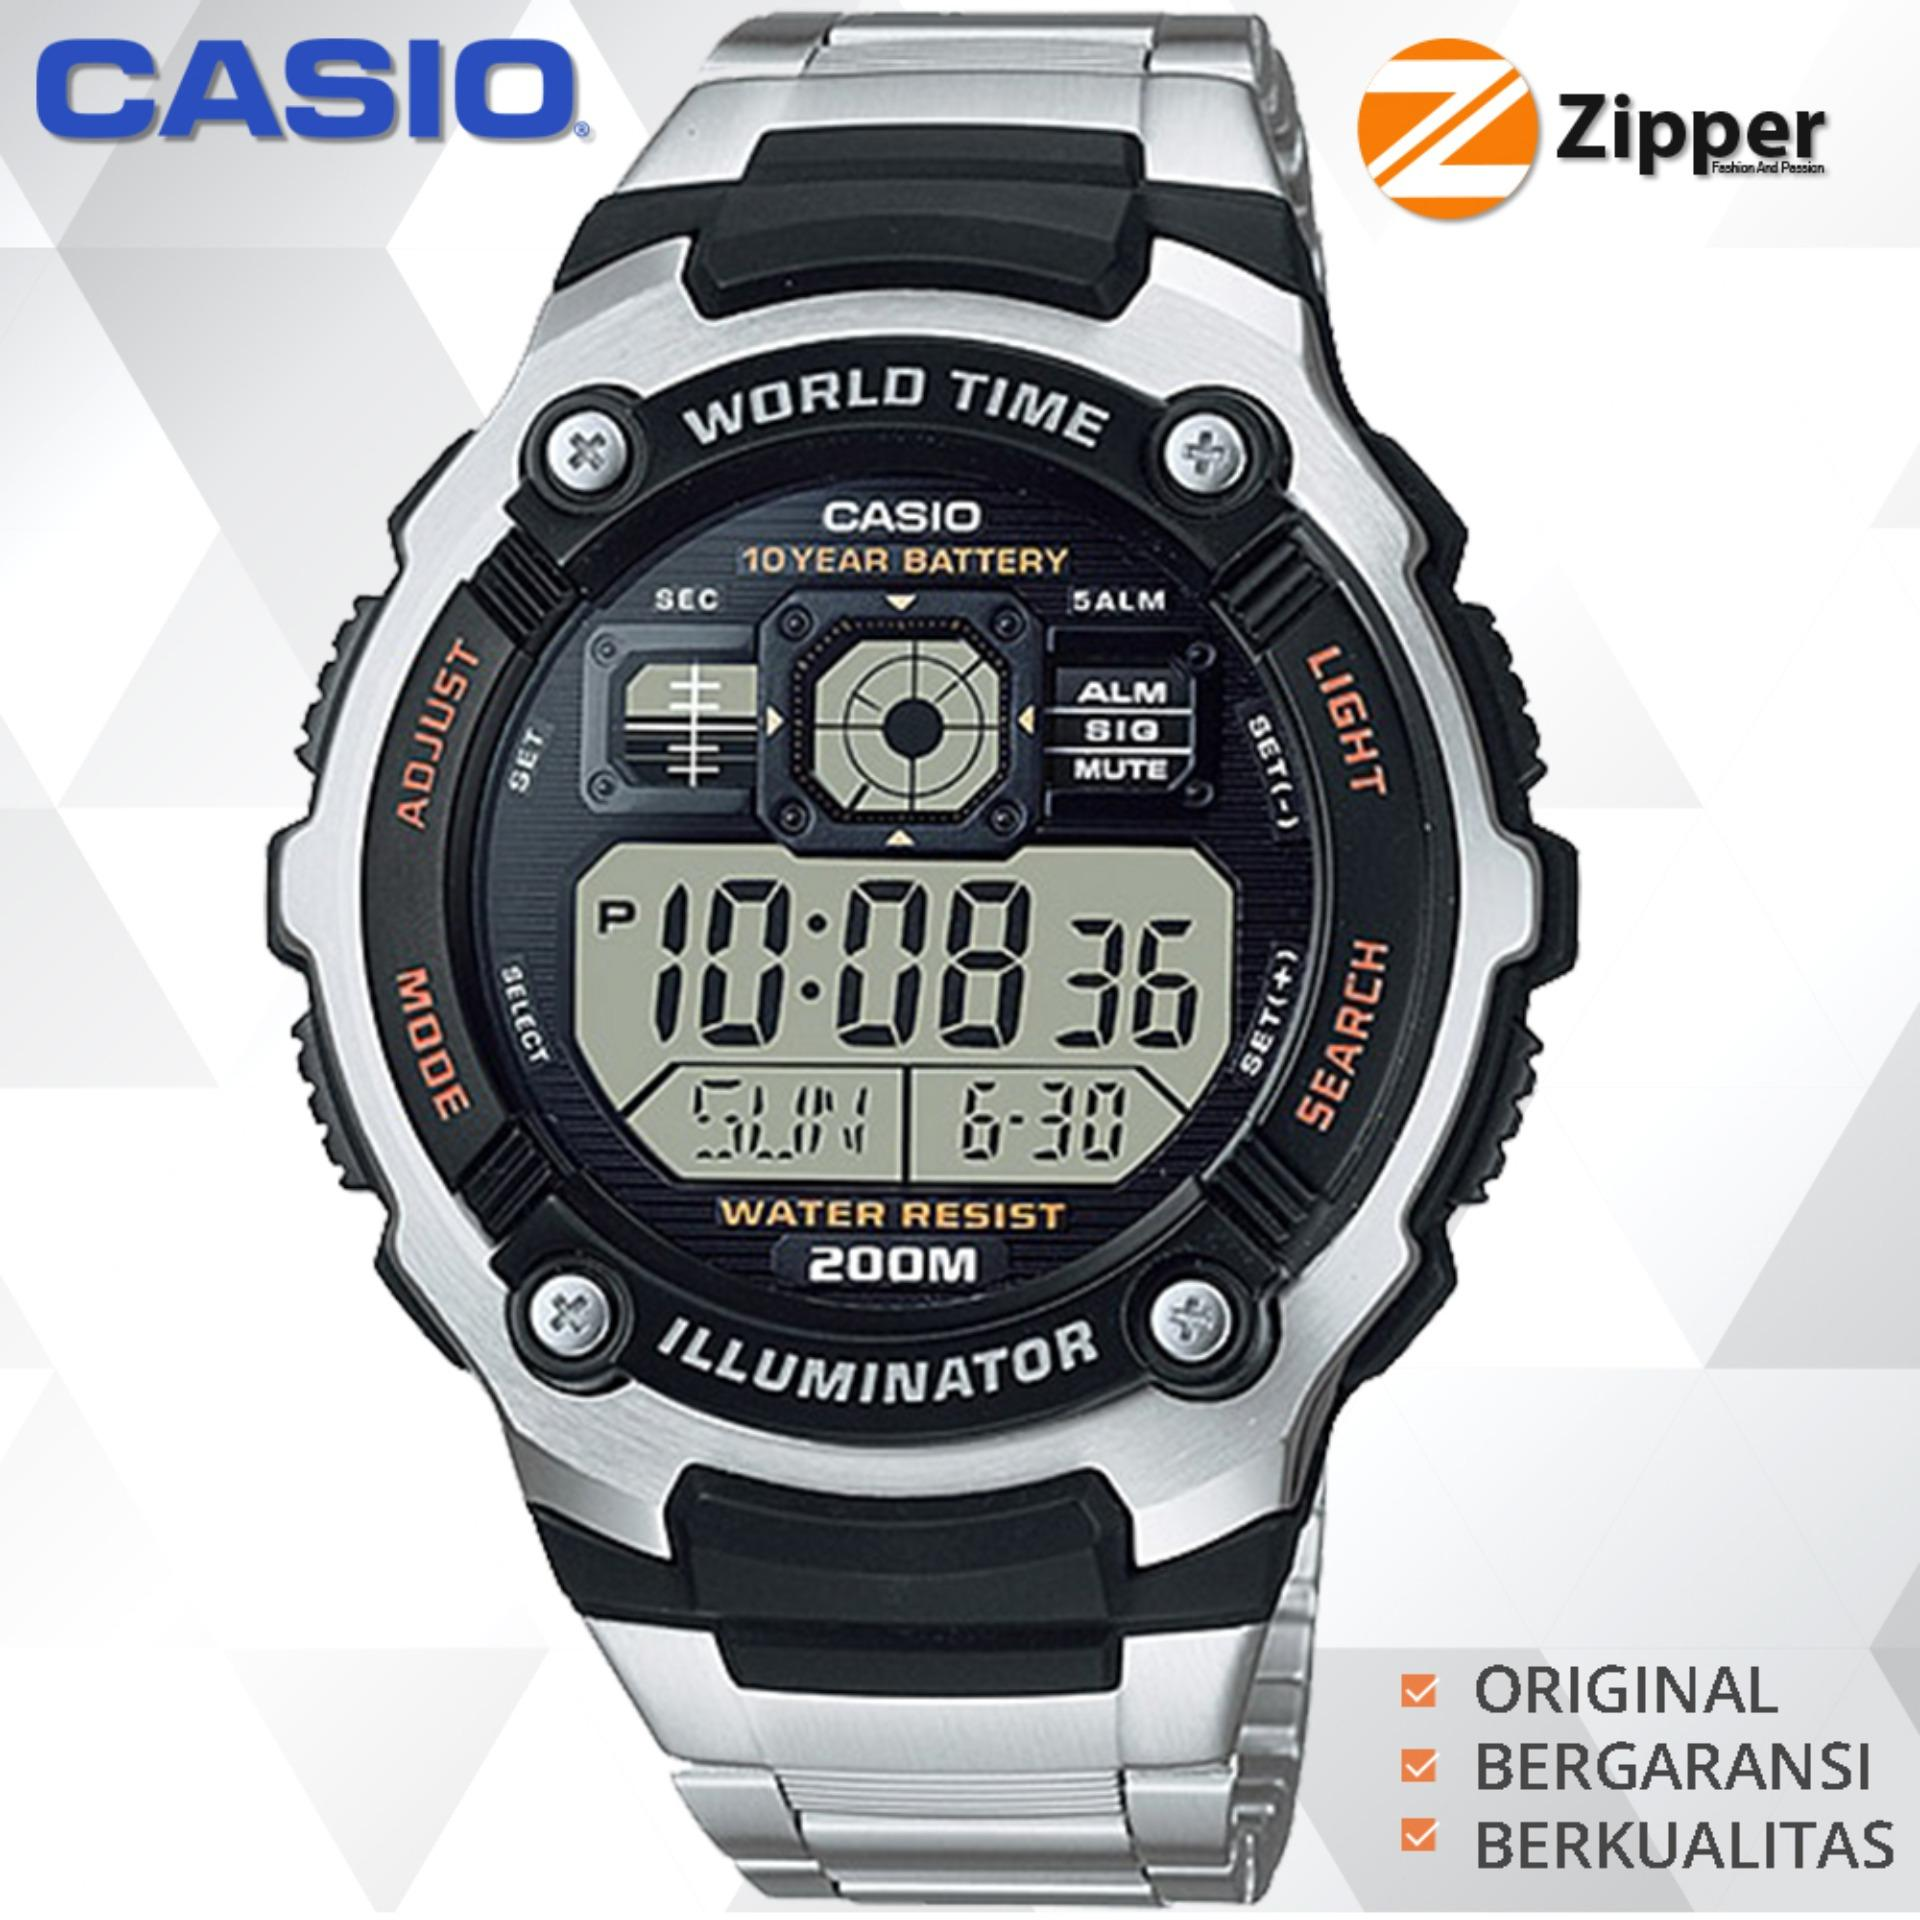 Casio Illuminator Jam Tangan Digital AE-2000 Series Youth Series